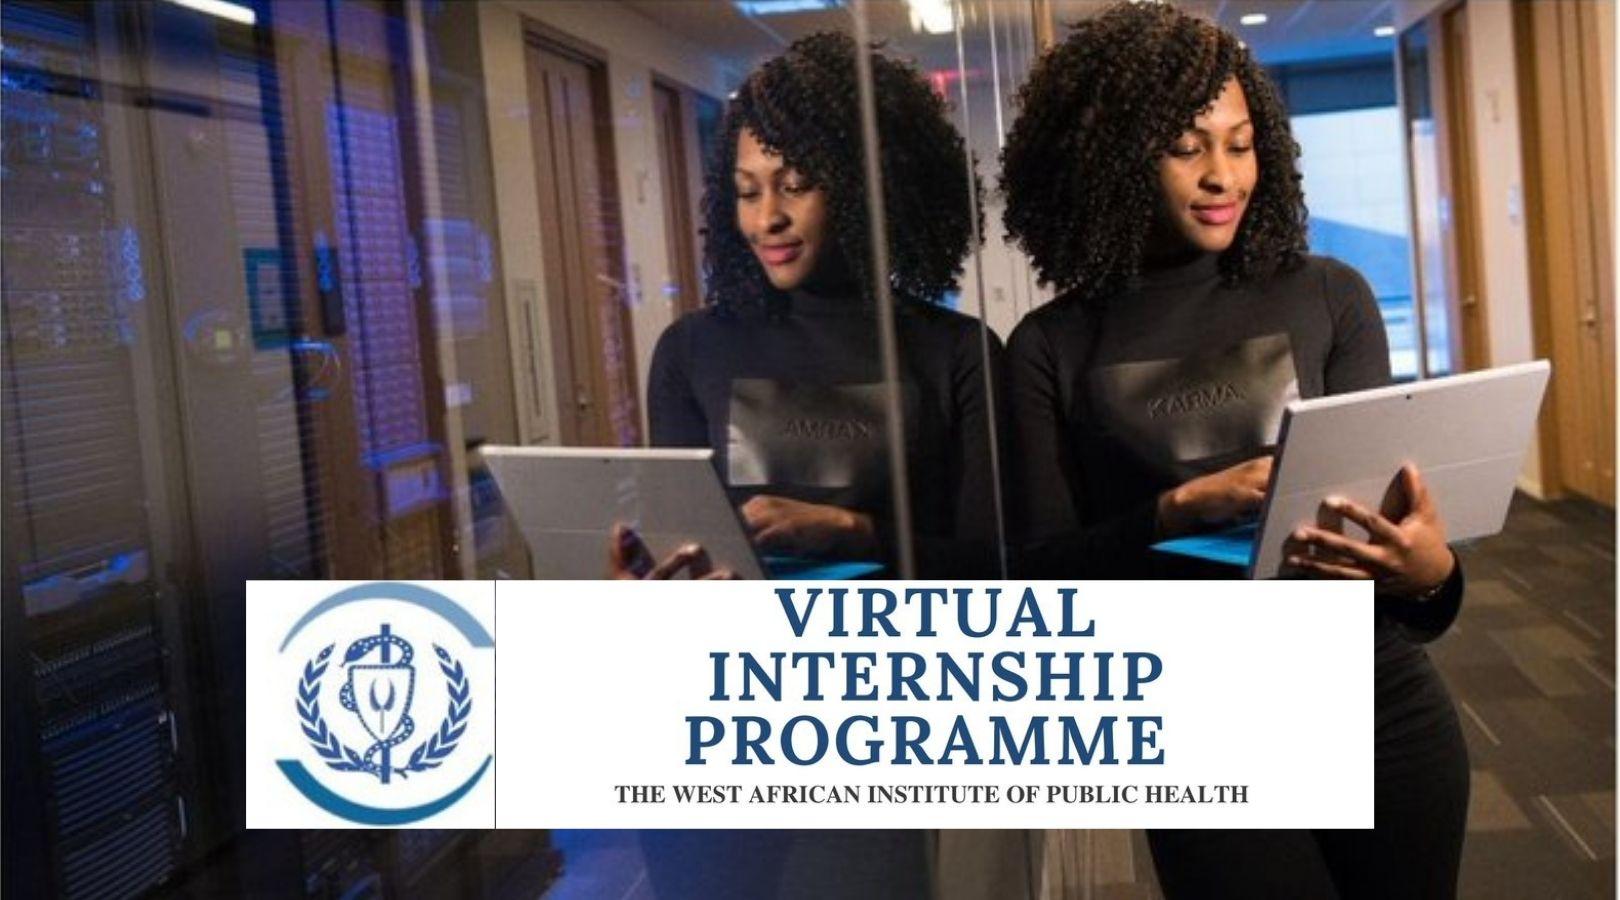 West African Institute of Public Health Virtual Internship Programme 2021